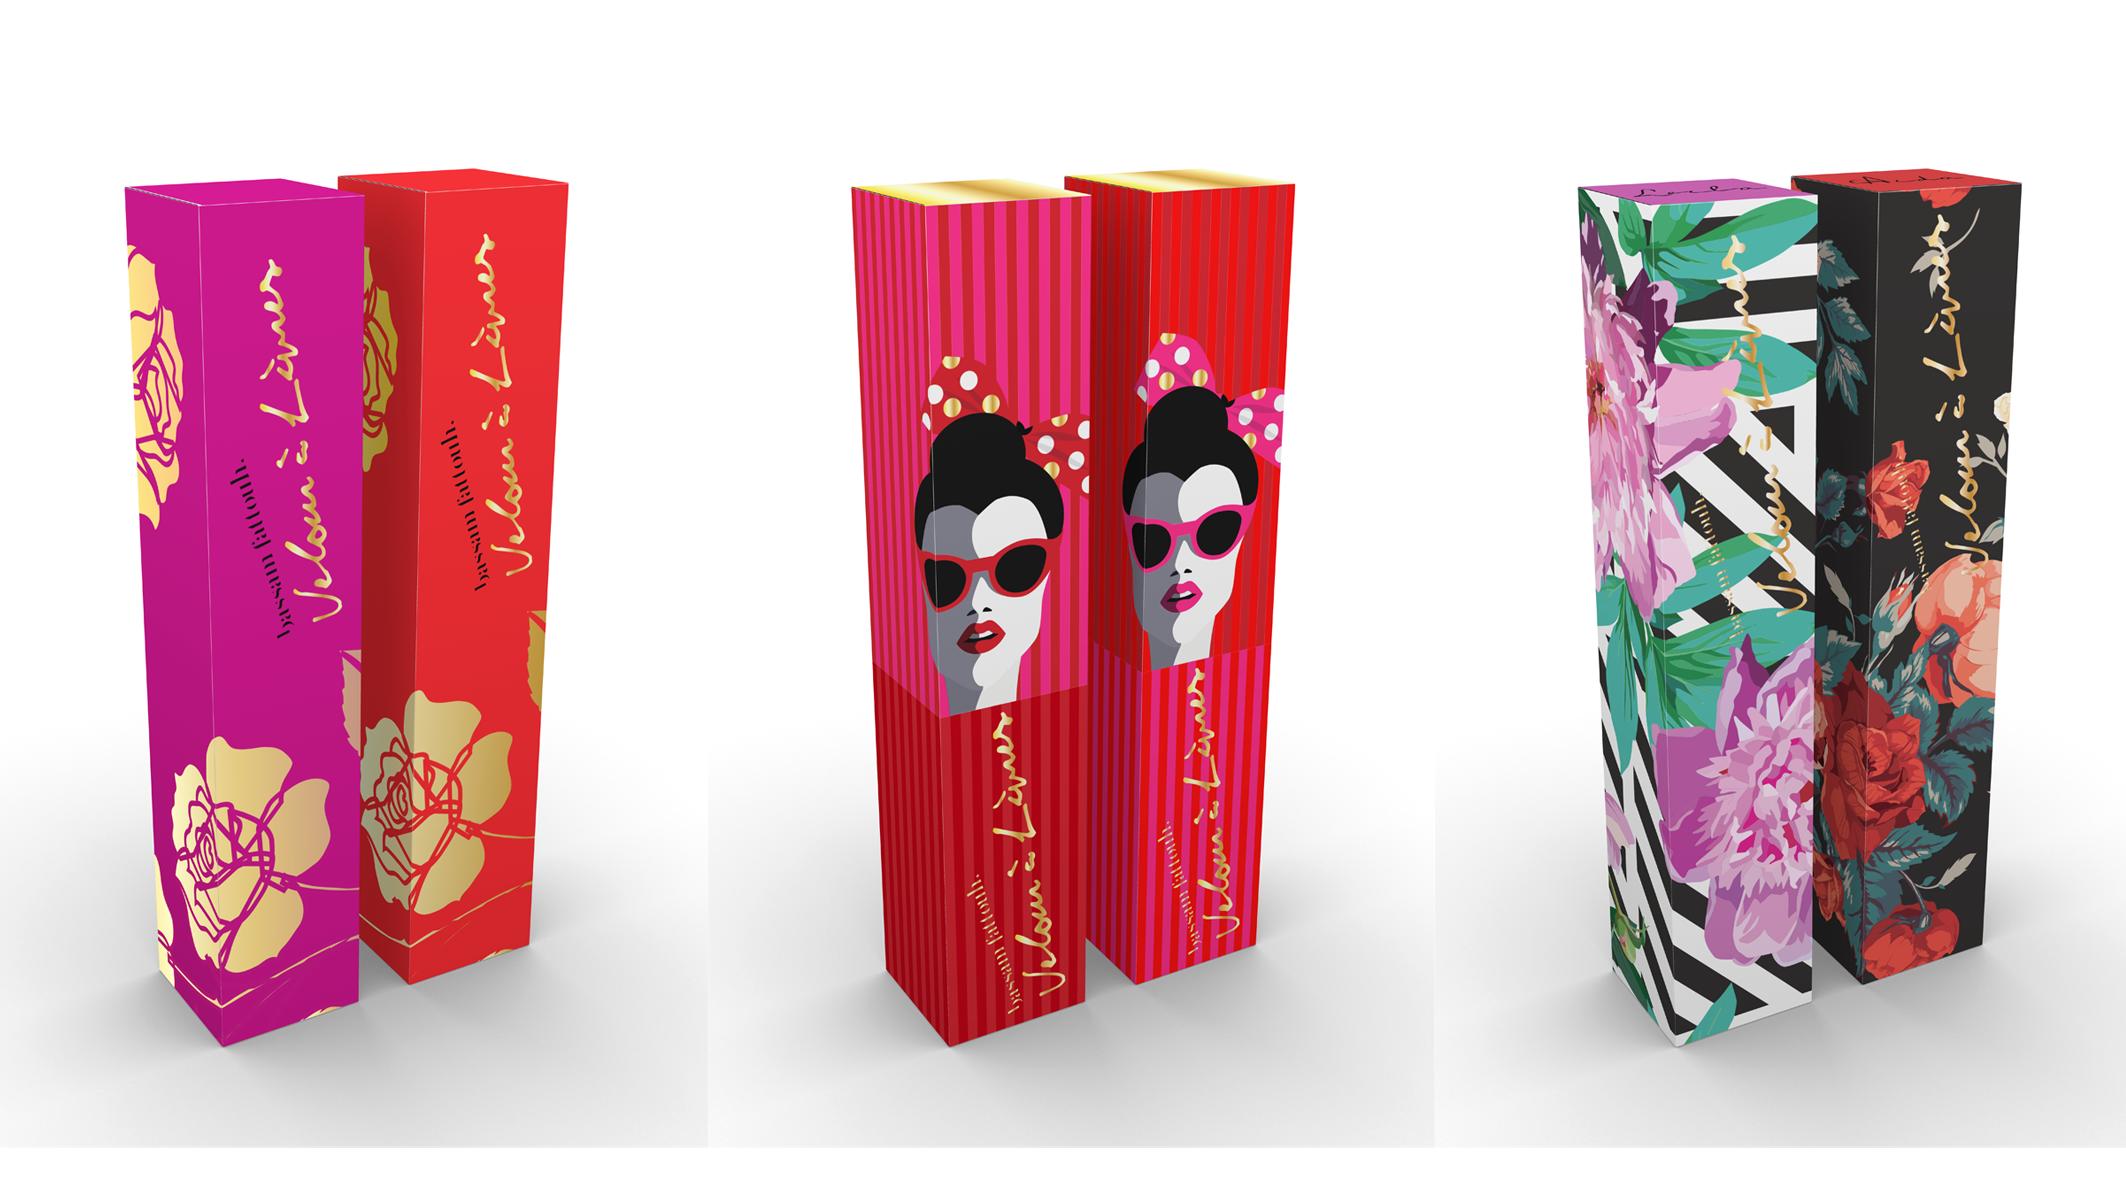 Bassam Fattouh Lip gloss (Beirut, Rana Salam Design Studio, 2016)